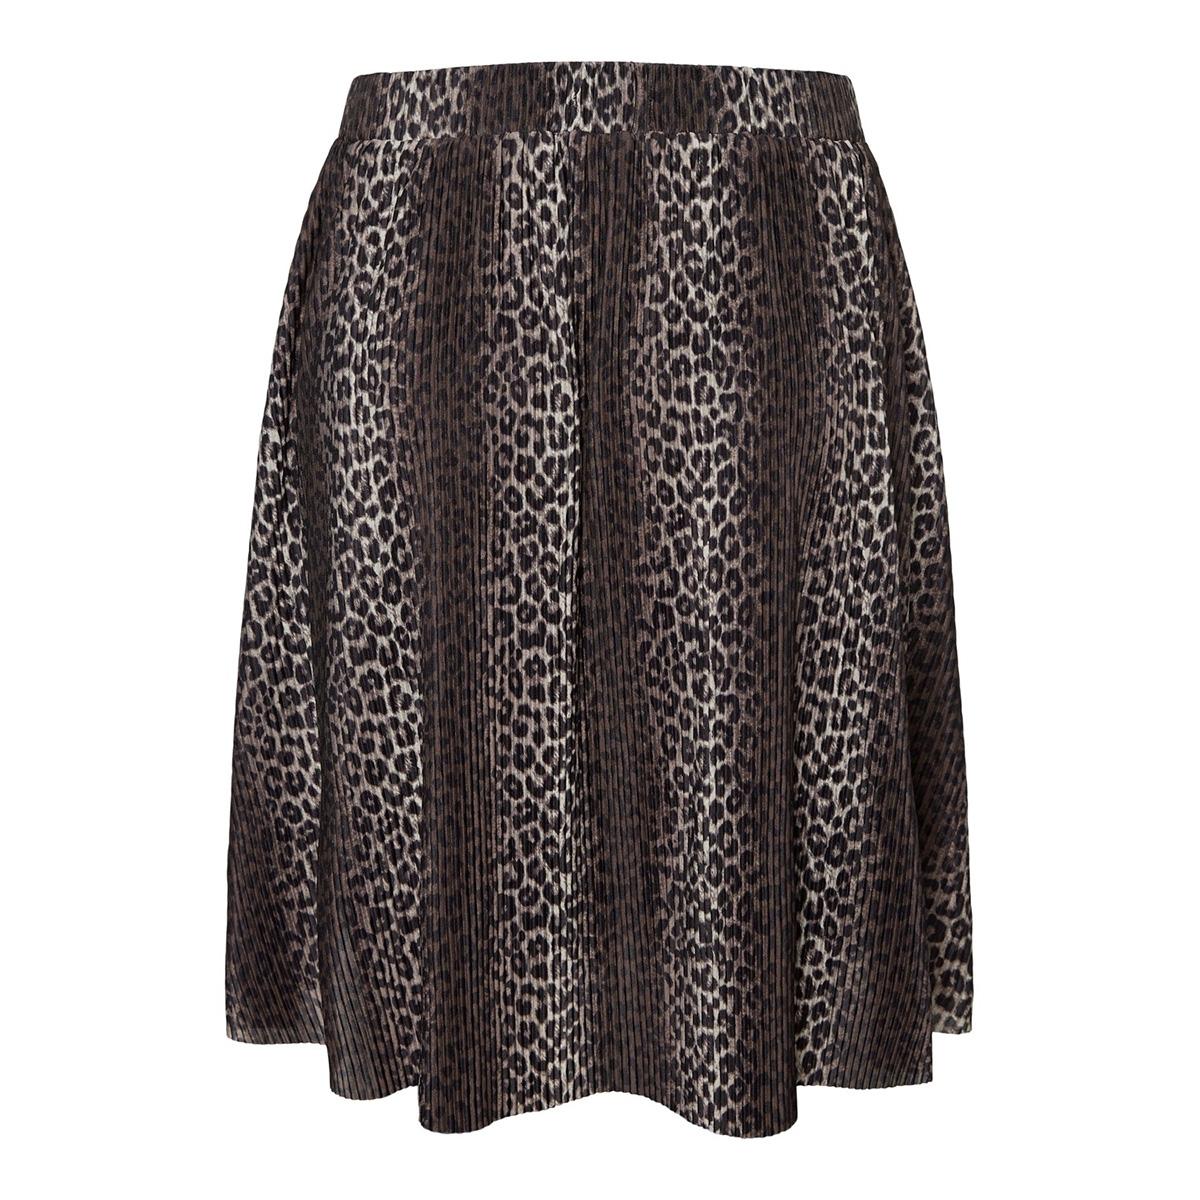 pcera hw skirt pb 17097329 pieces rok peyote/leo